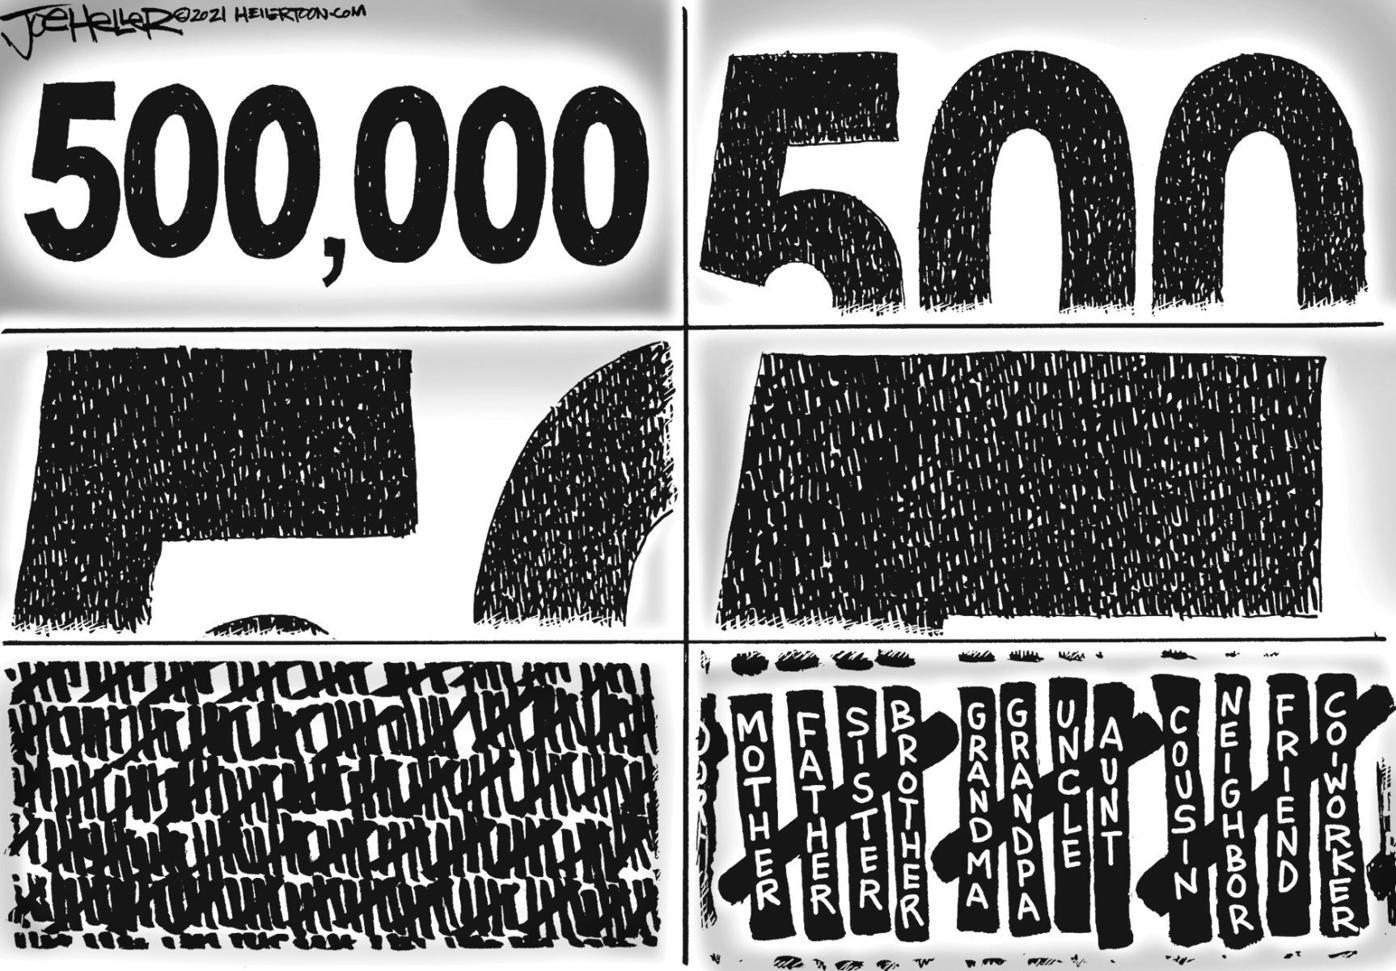 Editorial Cartoon: Feb. 24, 2021